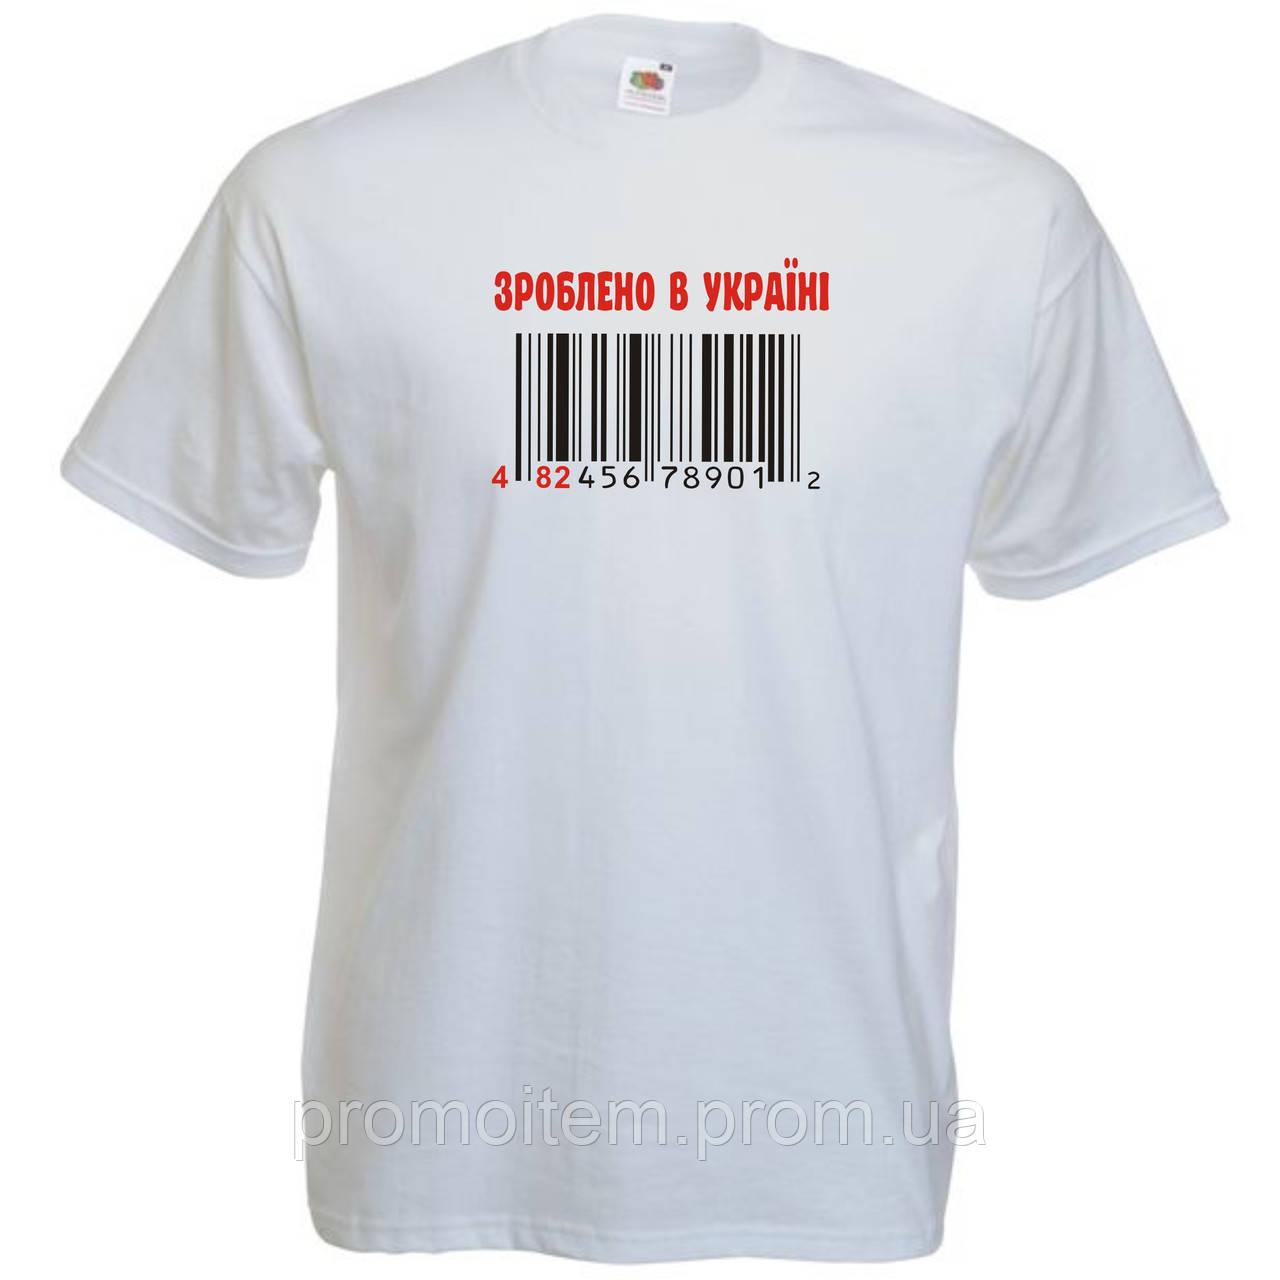 Патріотичні футболки Зроблено в Україні Патриотическая футболка 100% хлопок  - Рекламно производственная компания